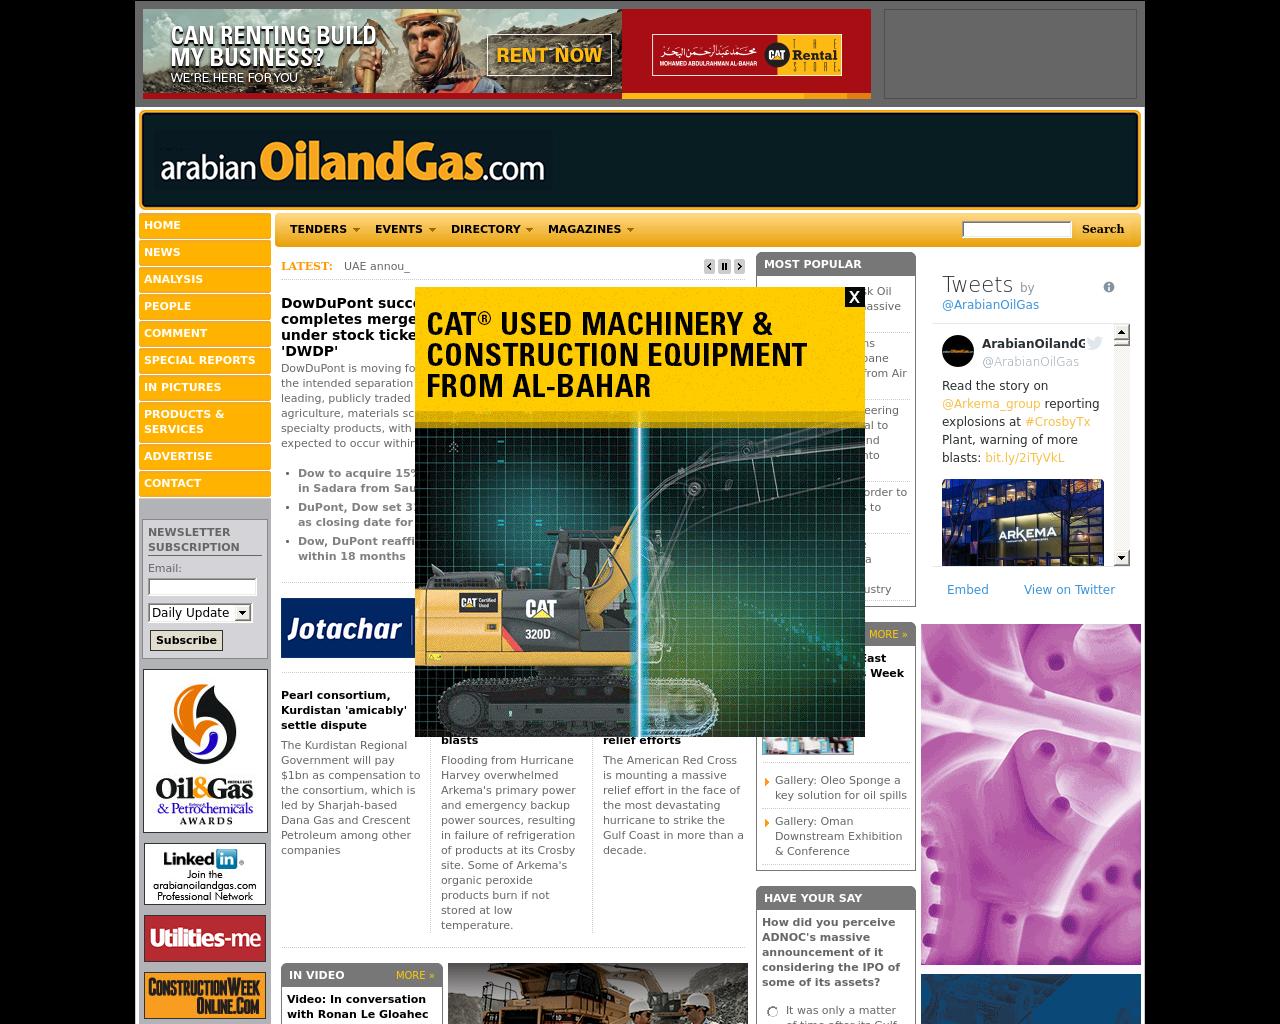 Arabian-OilandGas.com-Advertising-Reviews-Pricing